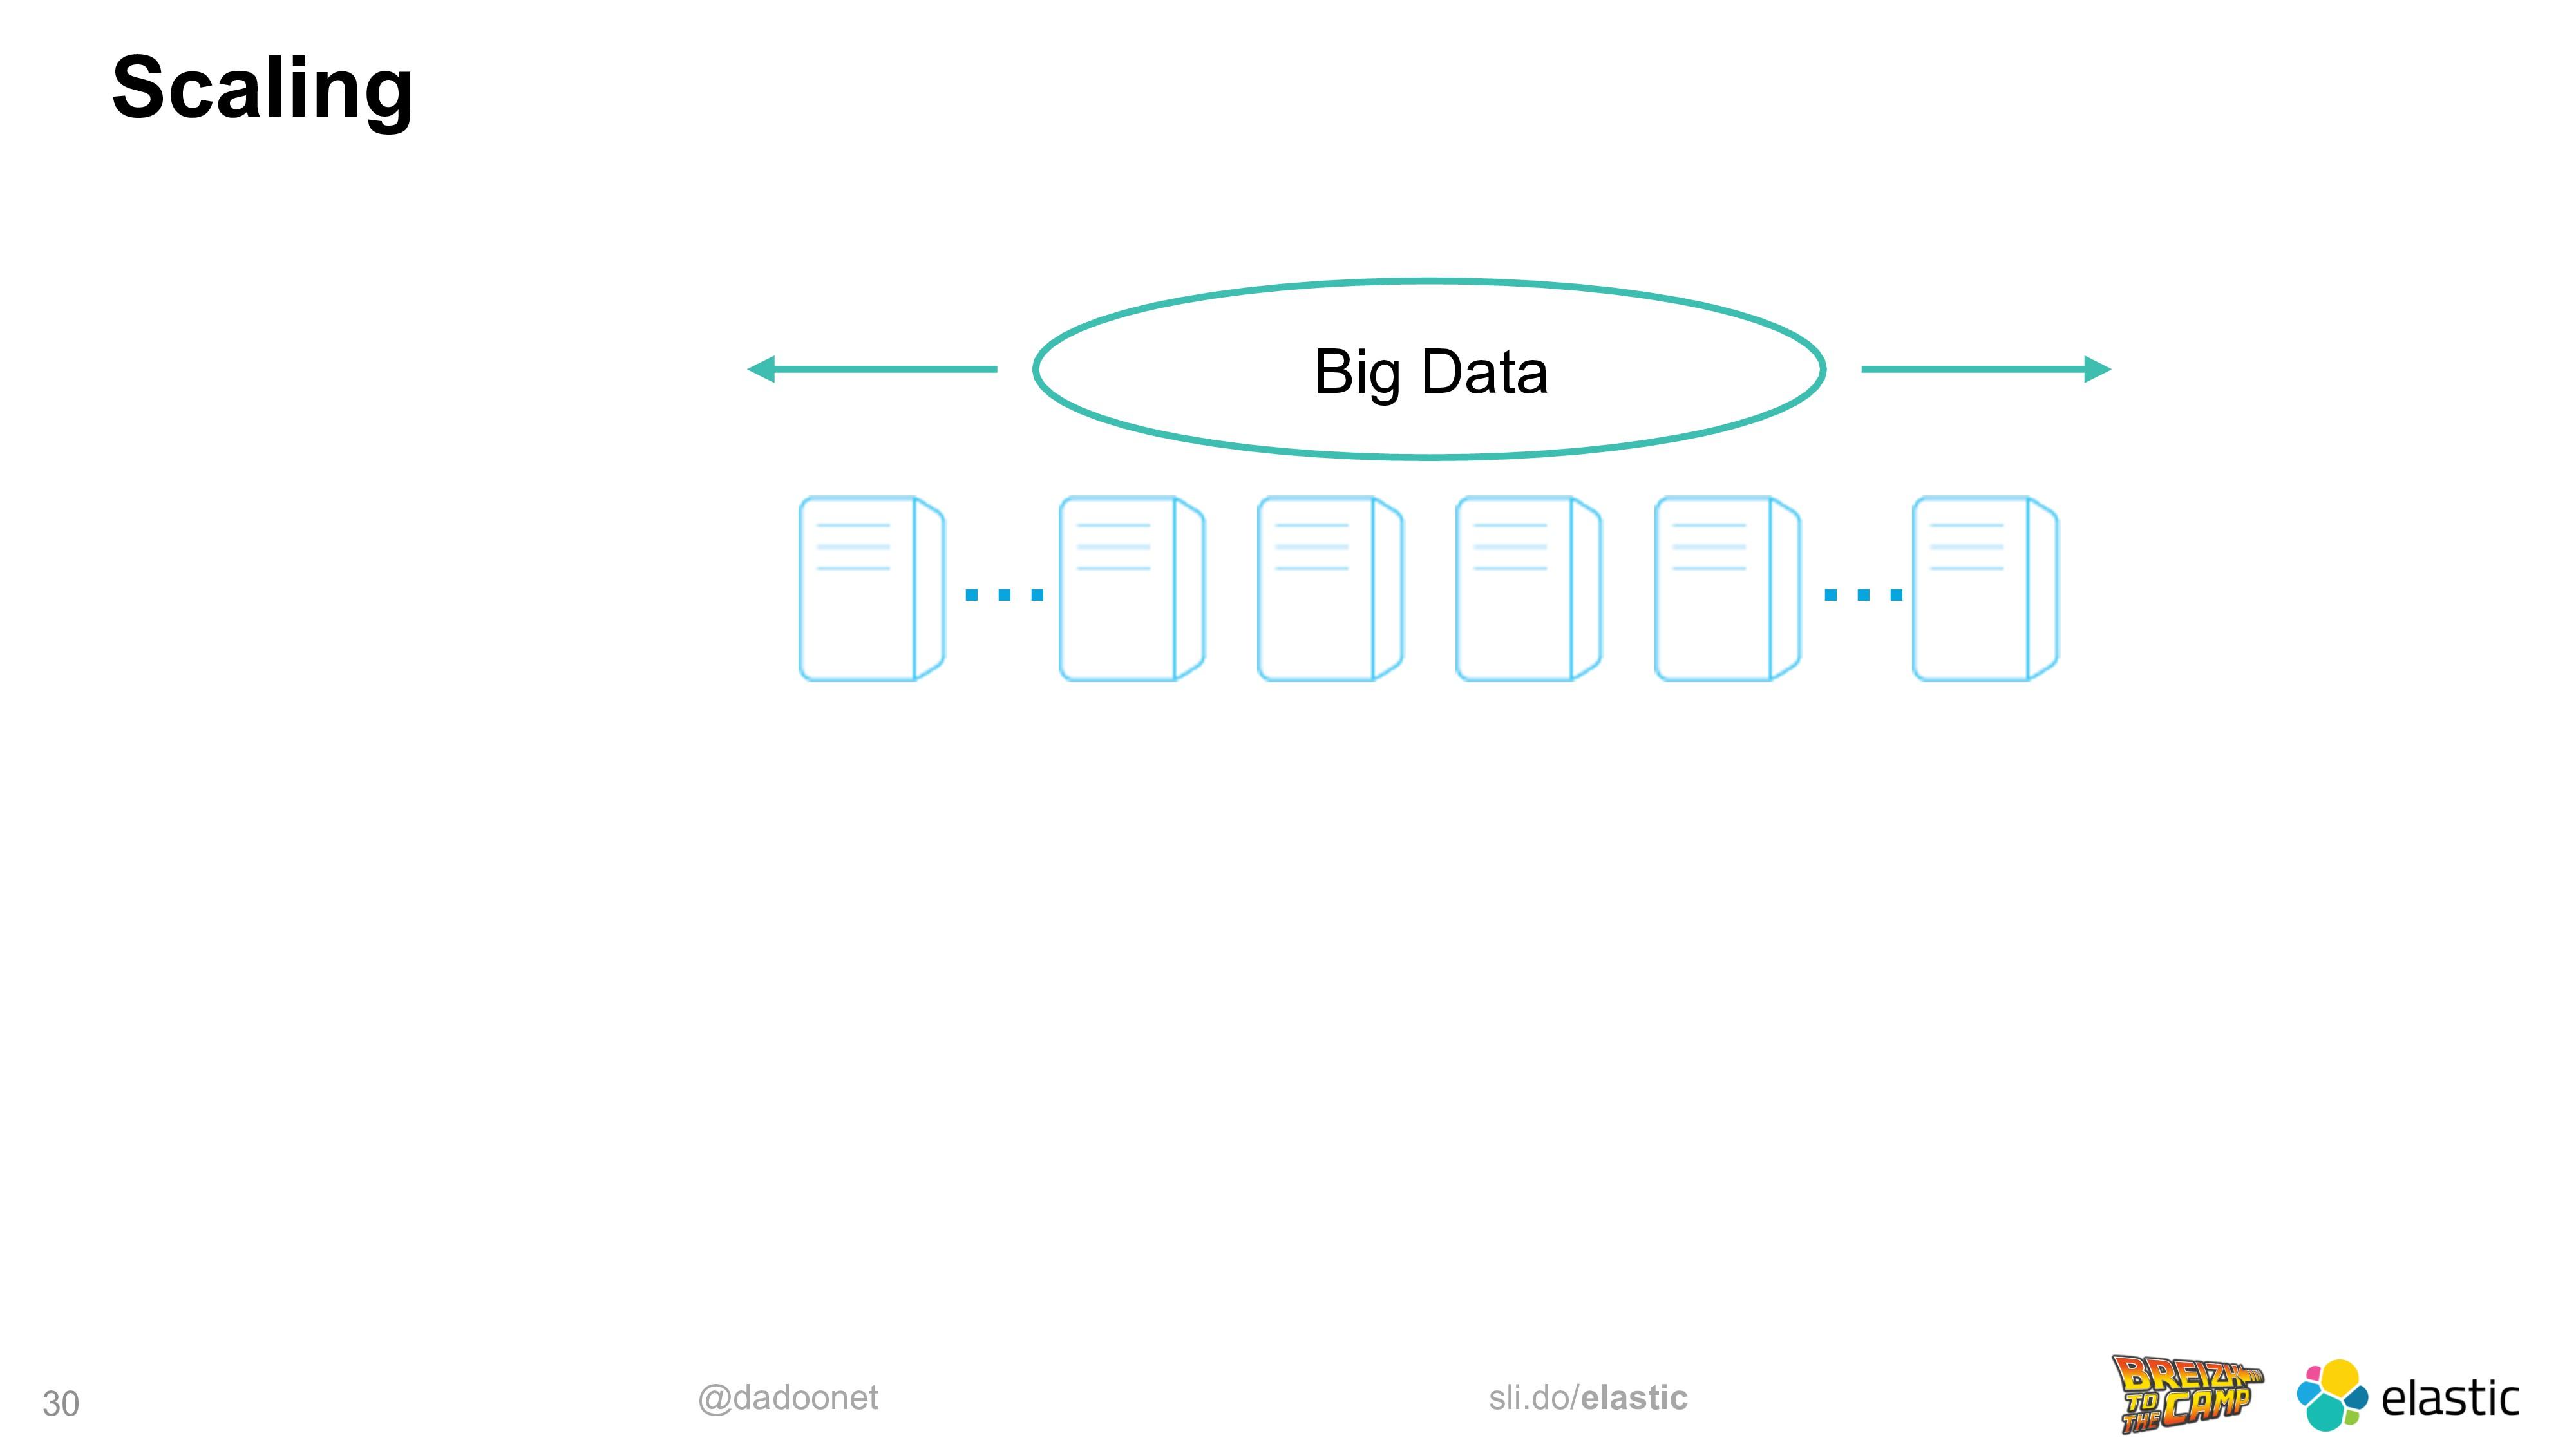 @dadoonet sli.do/elastic 30 Scaling Big Data .....